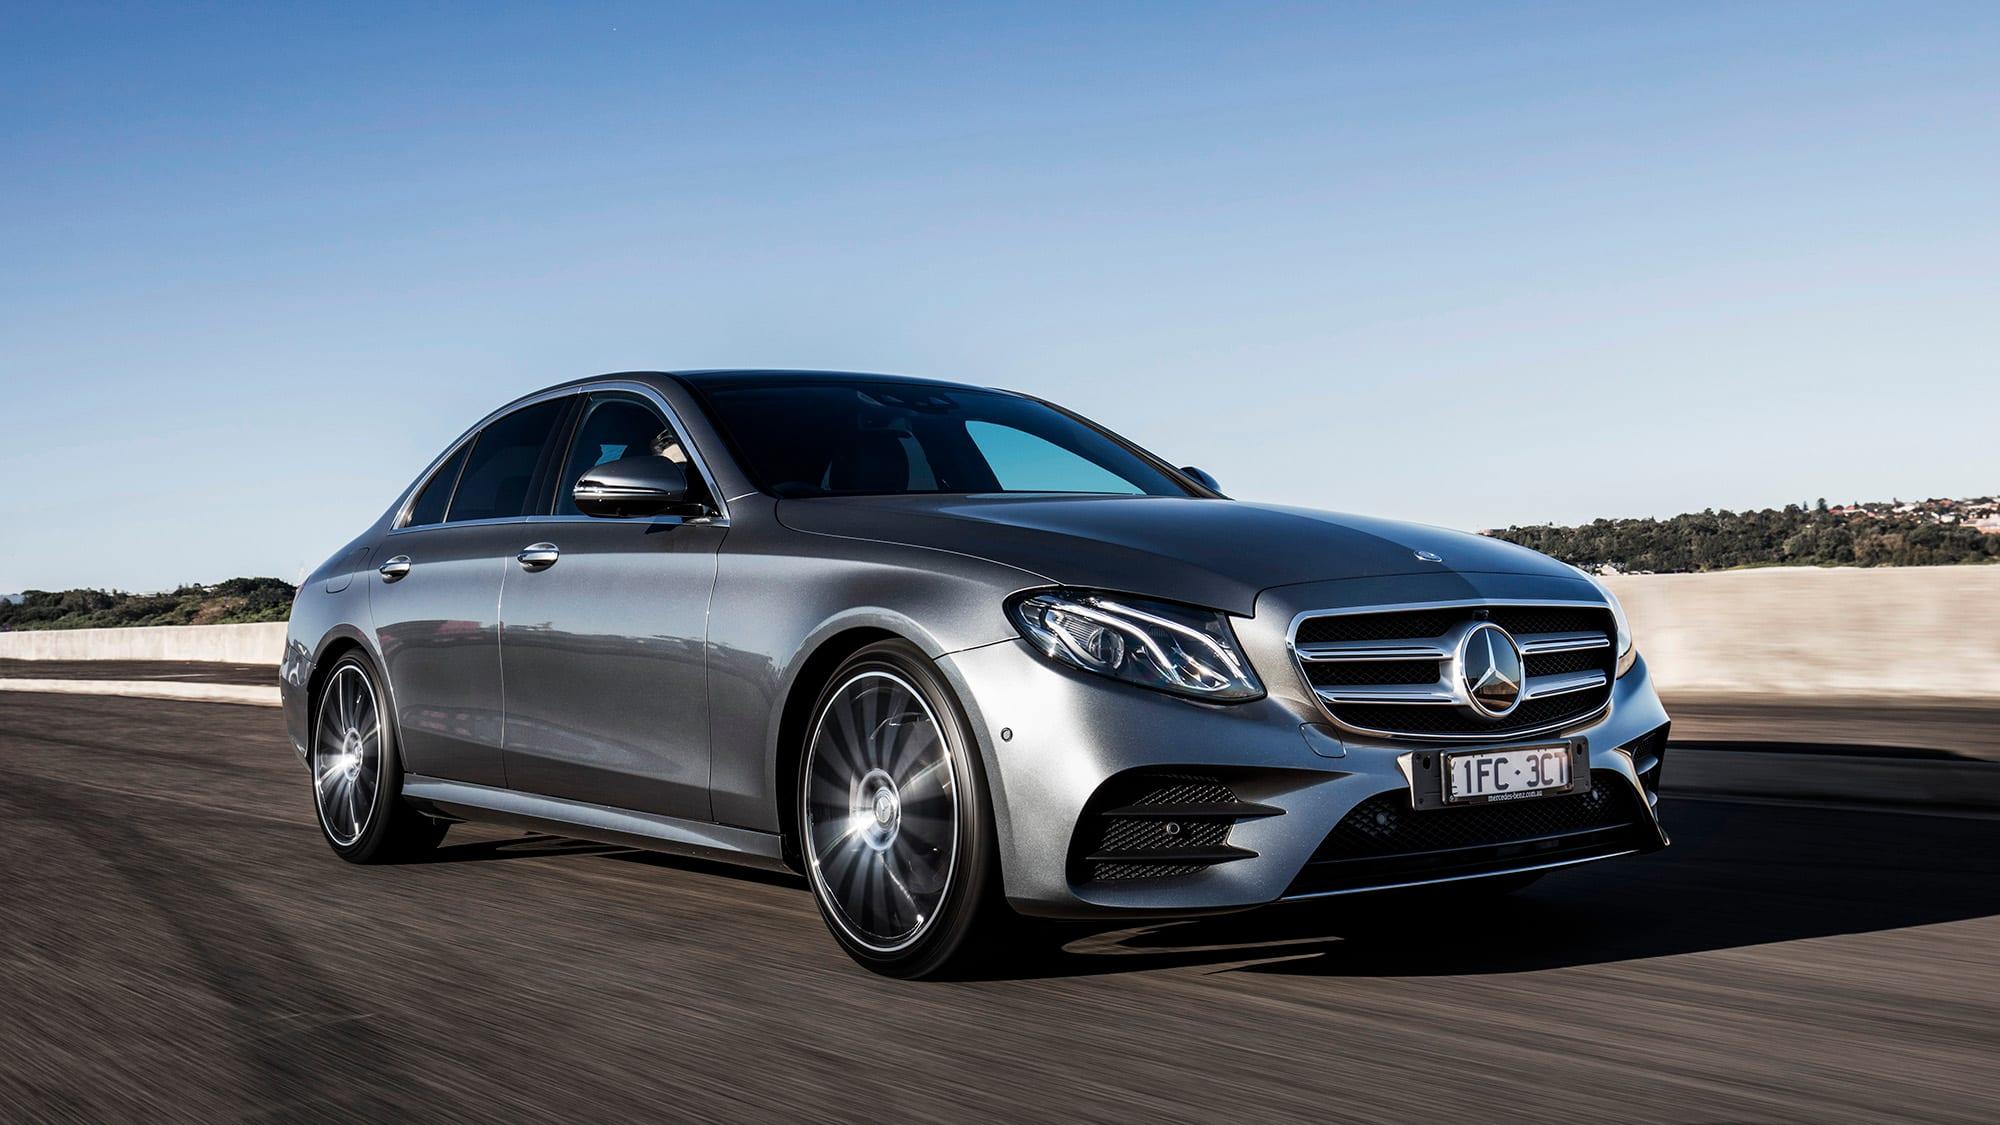 Mercedes Benz E Class image142135 c